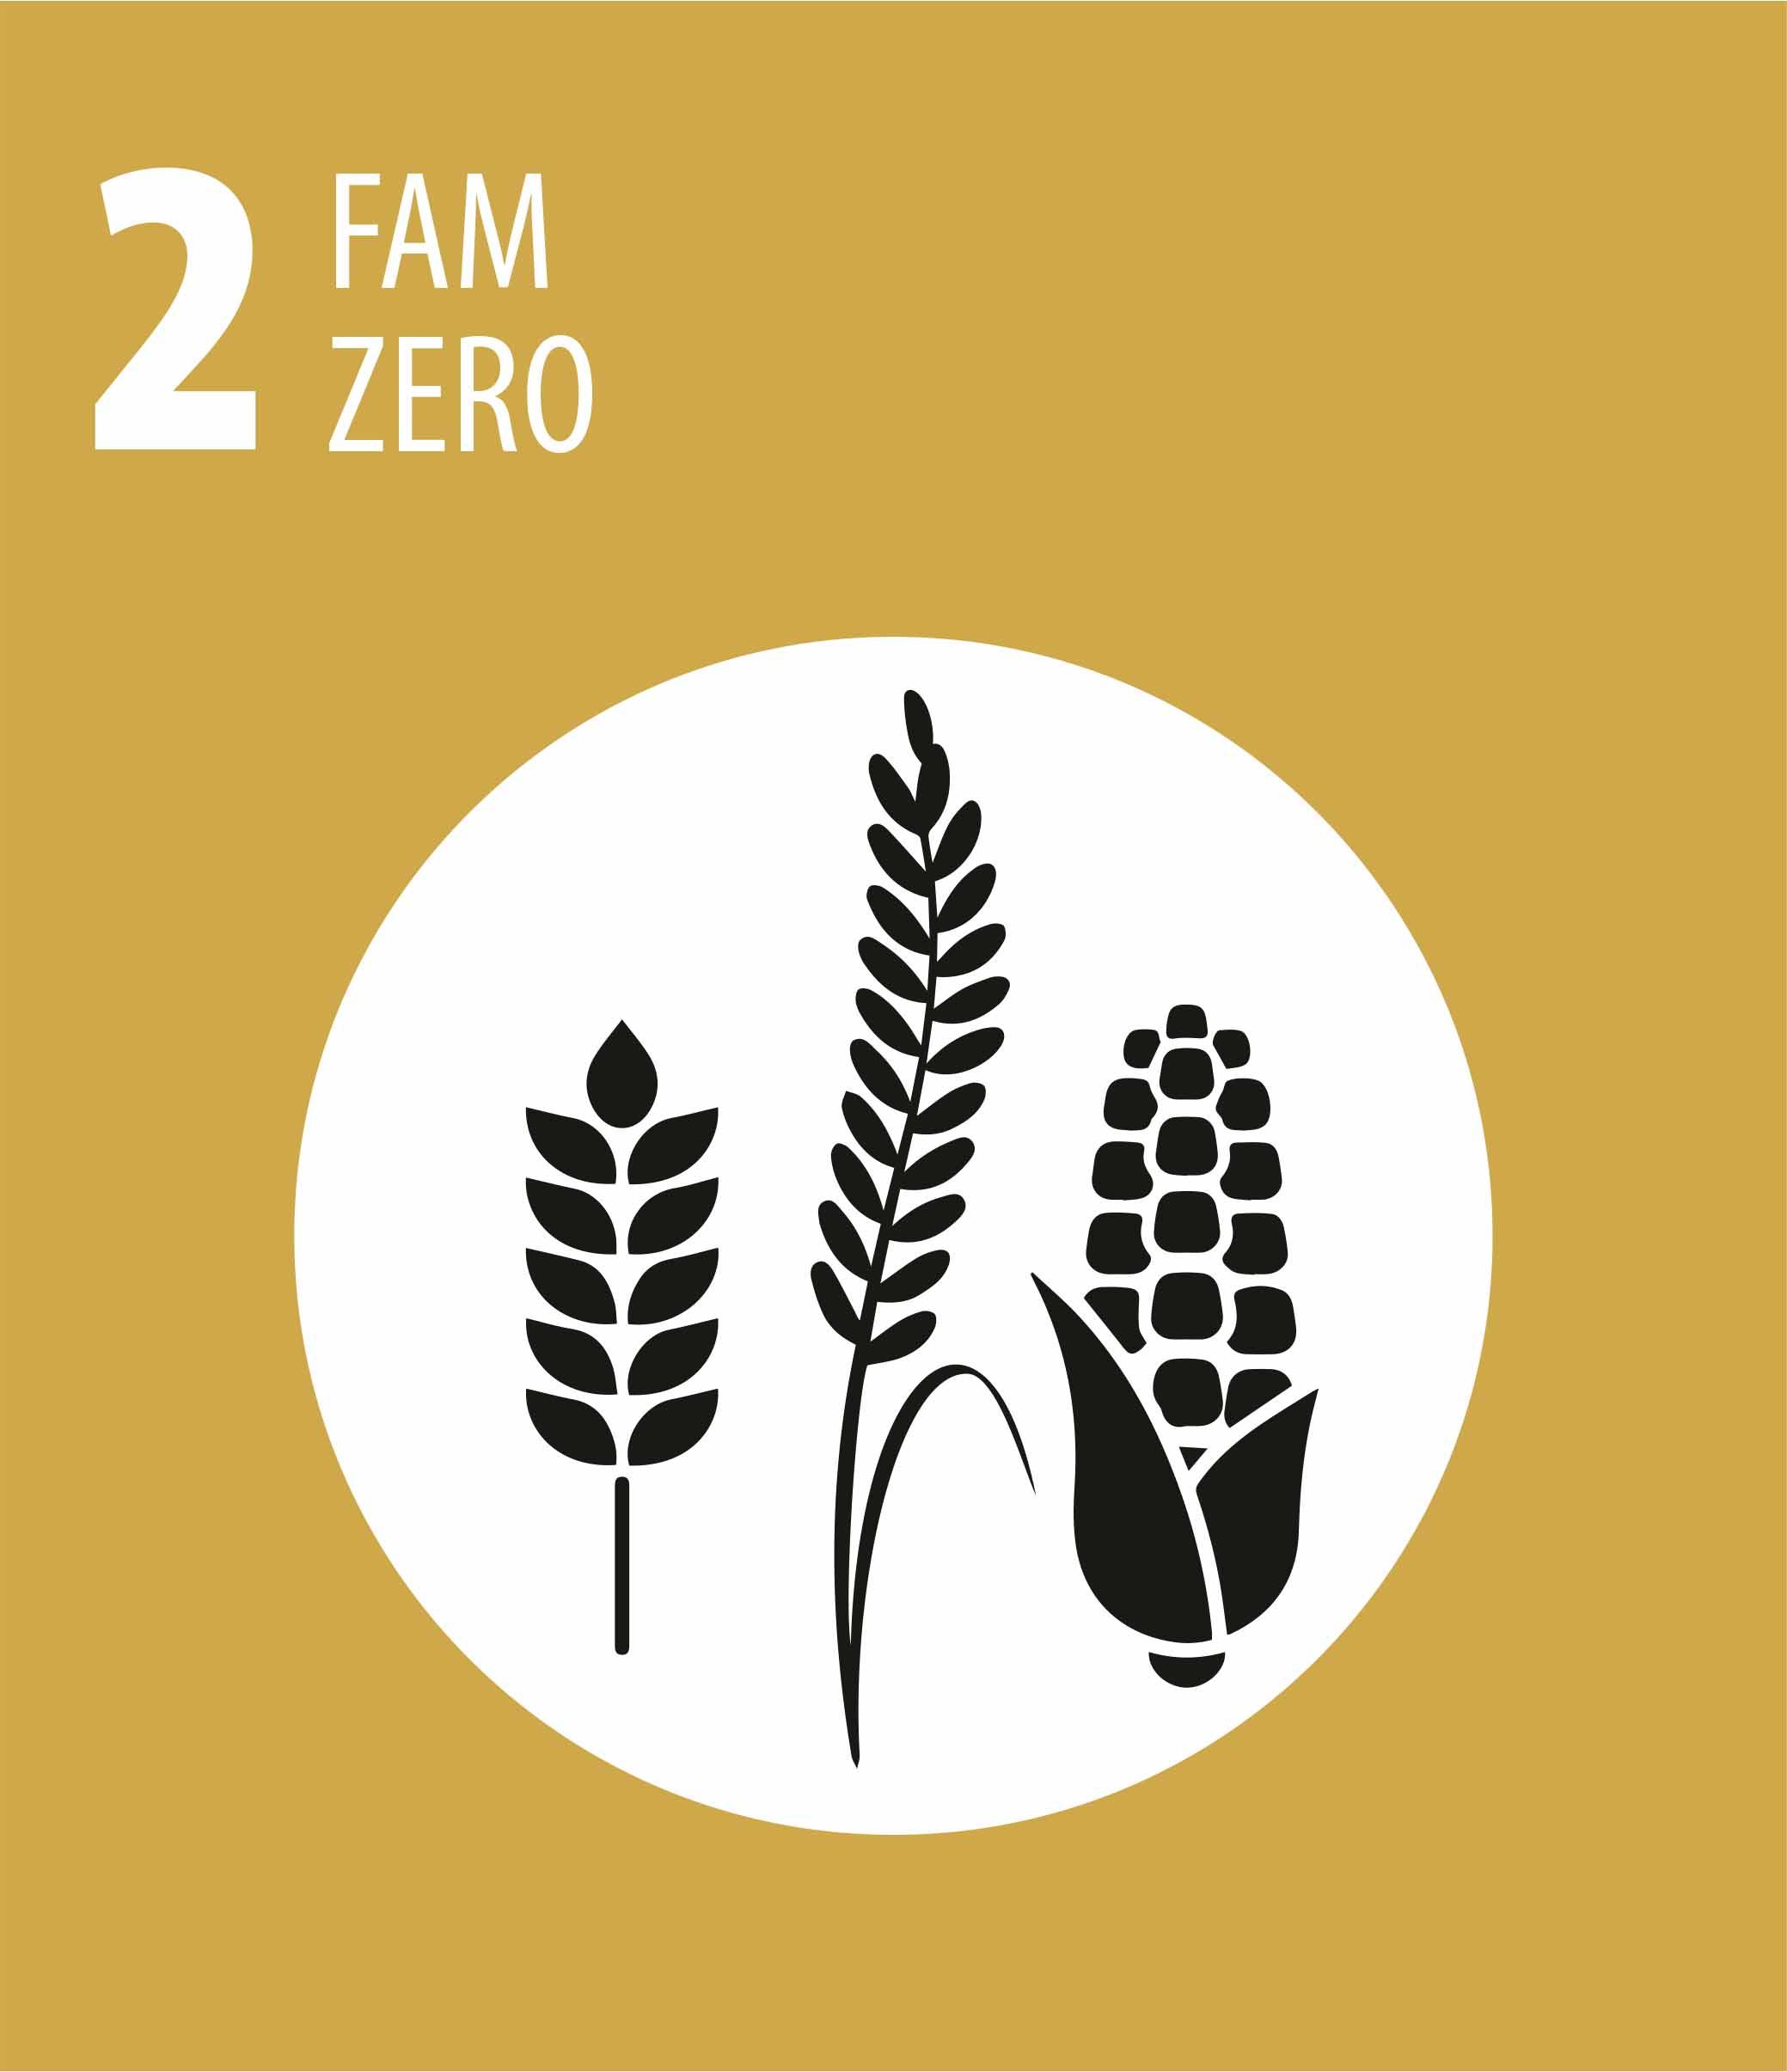 ODS 2 Fam zero